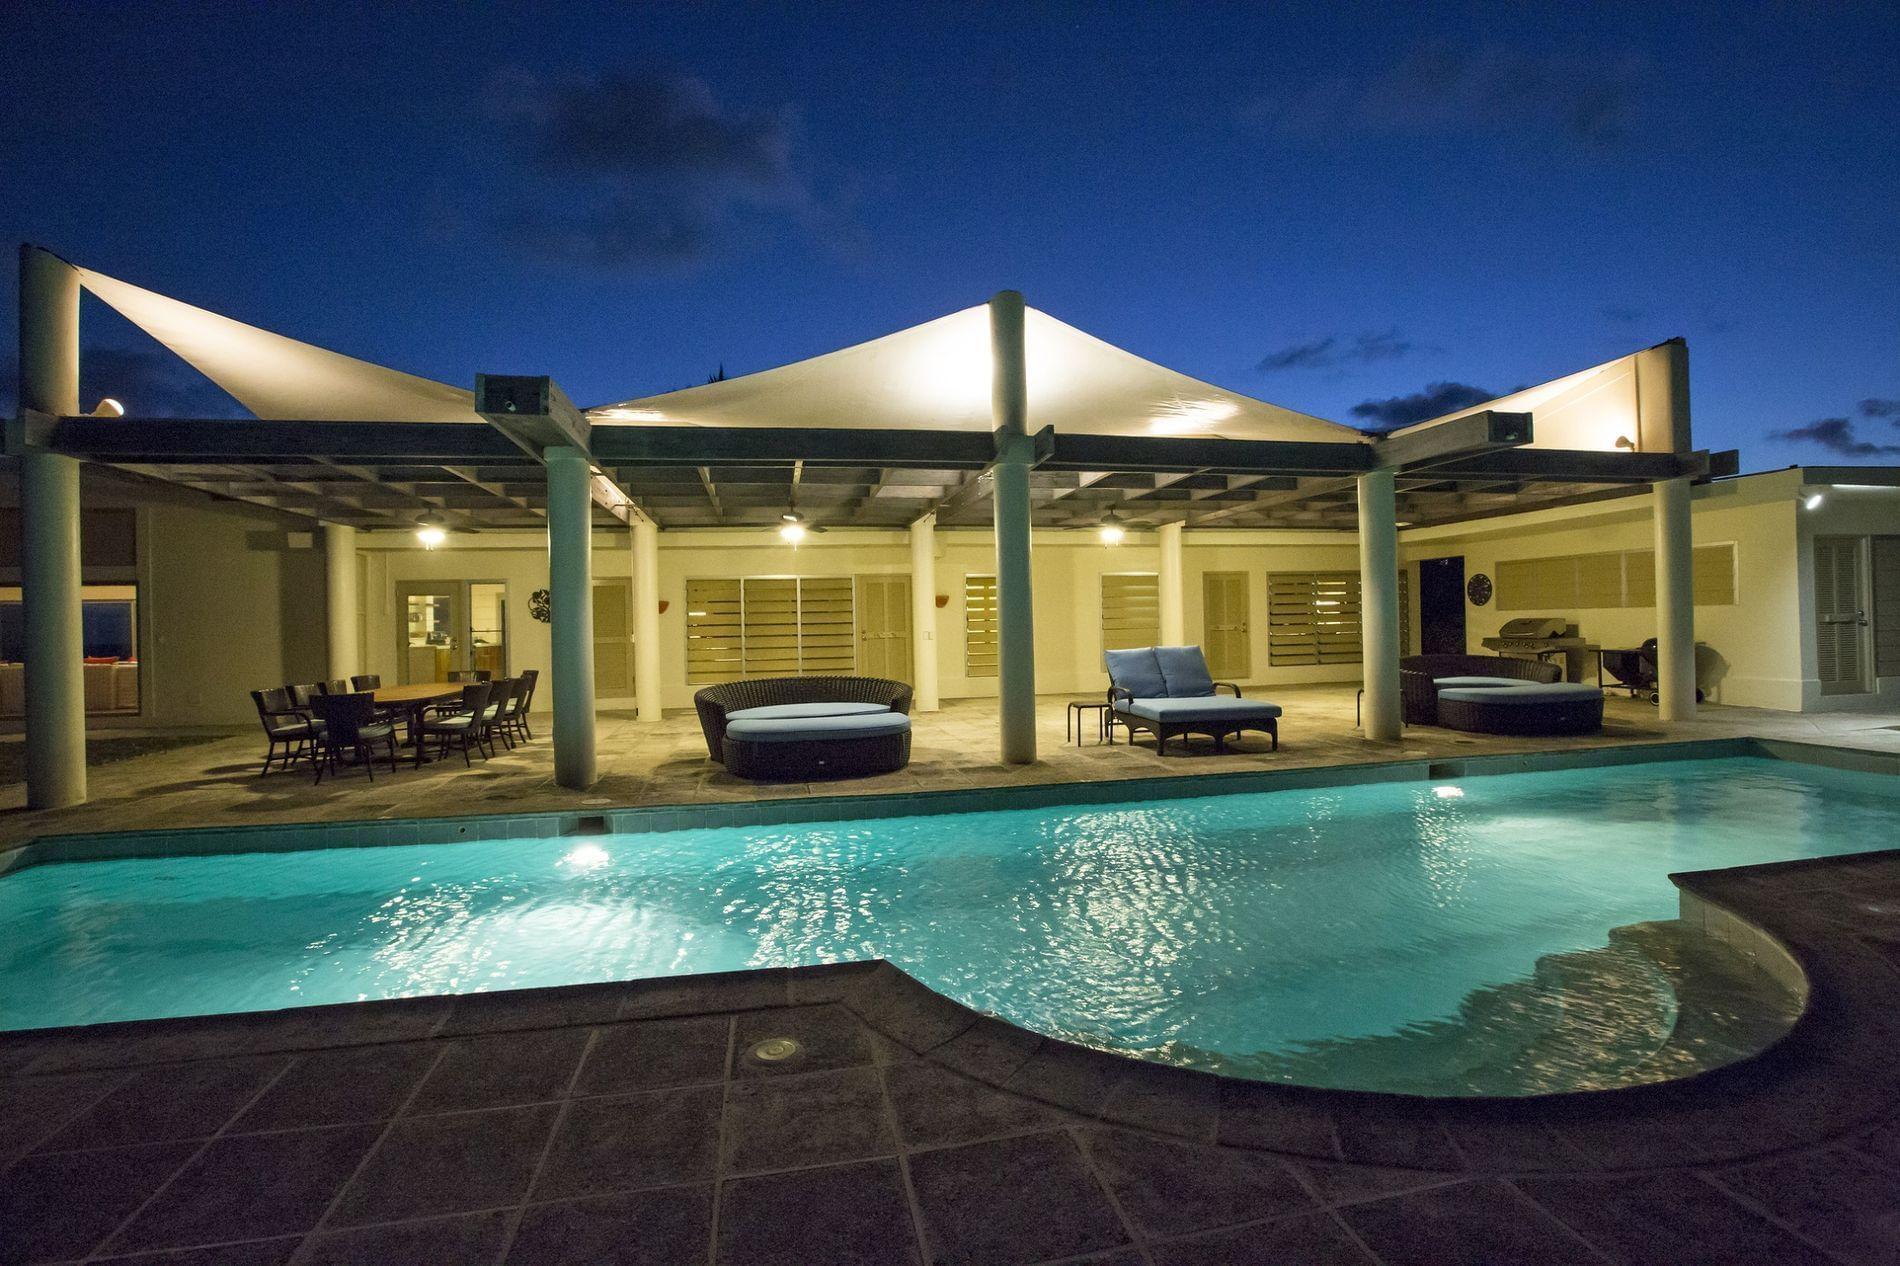 Beach House Outdoor Pool